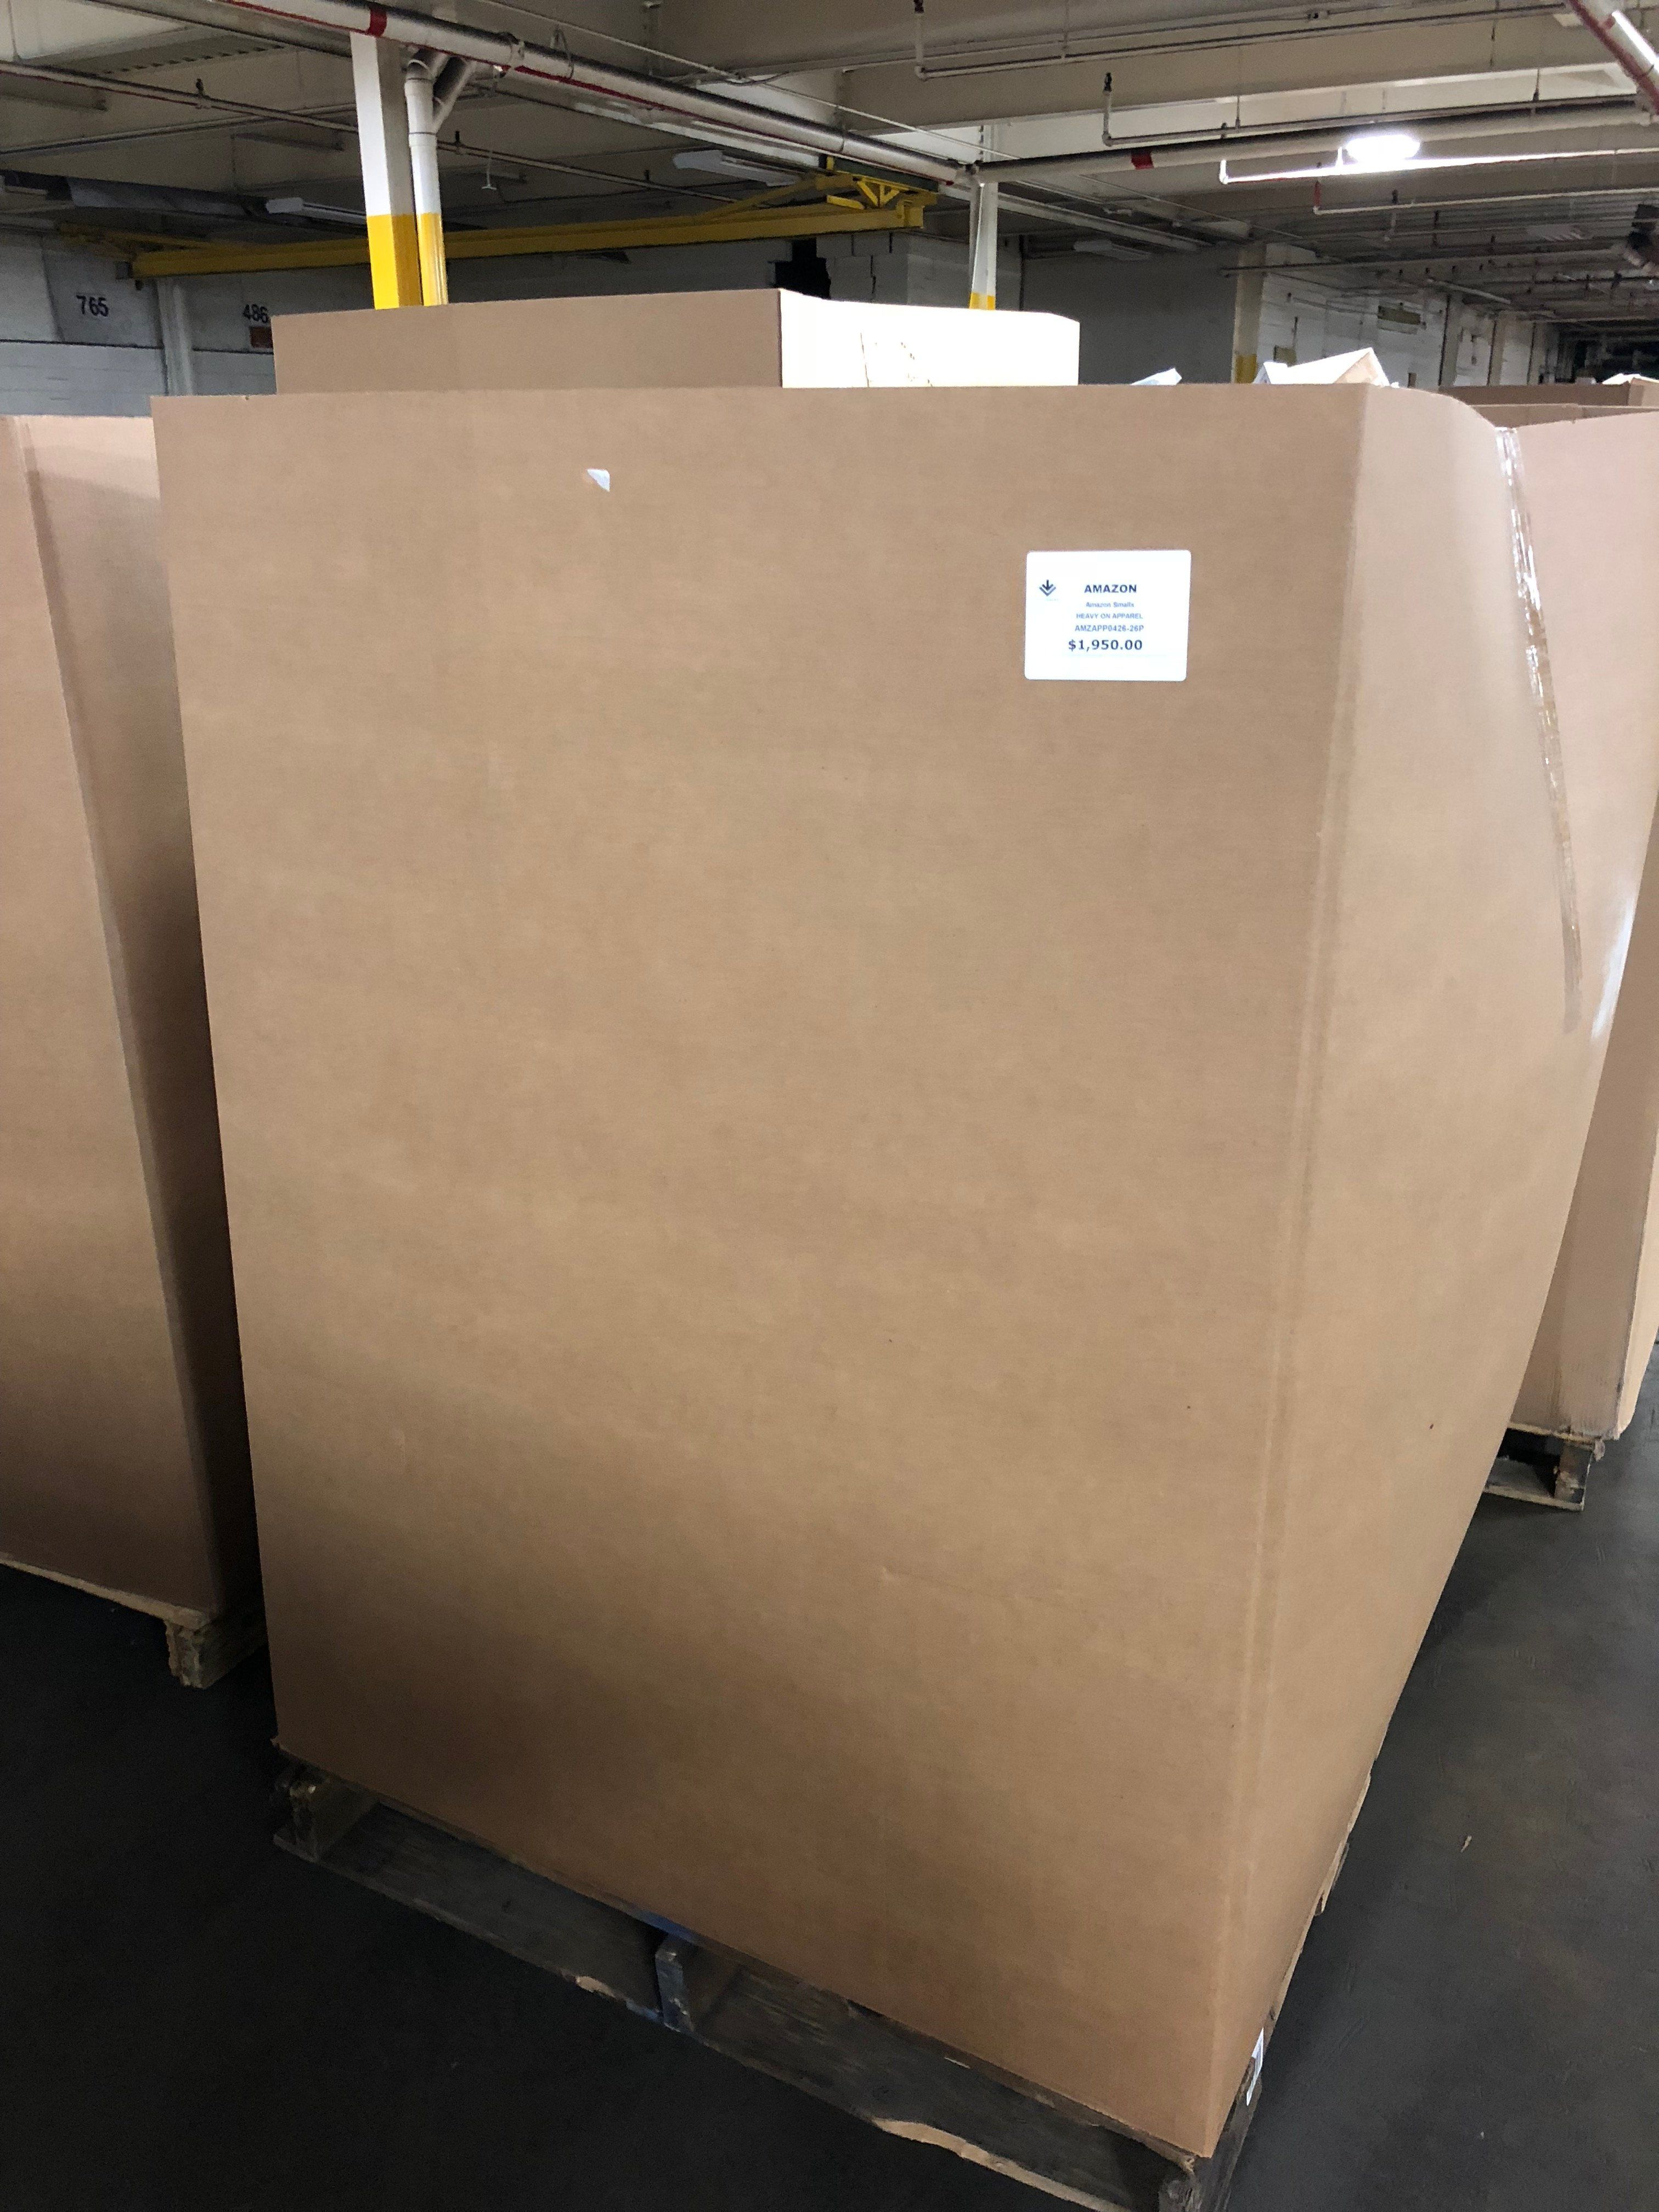 Amazon Heavy Apparel Pallets #online #amazon #liquidation